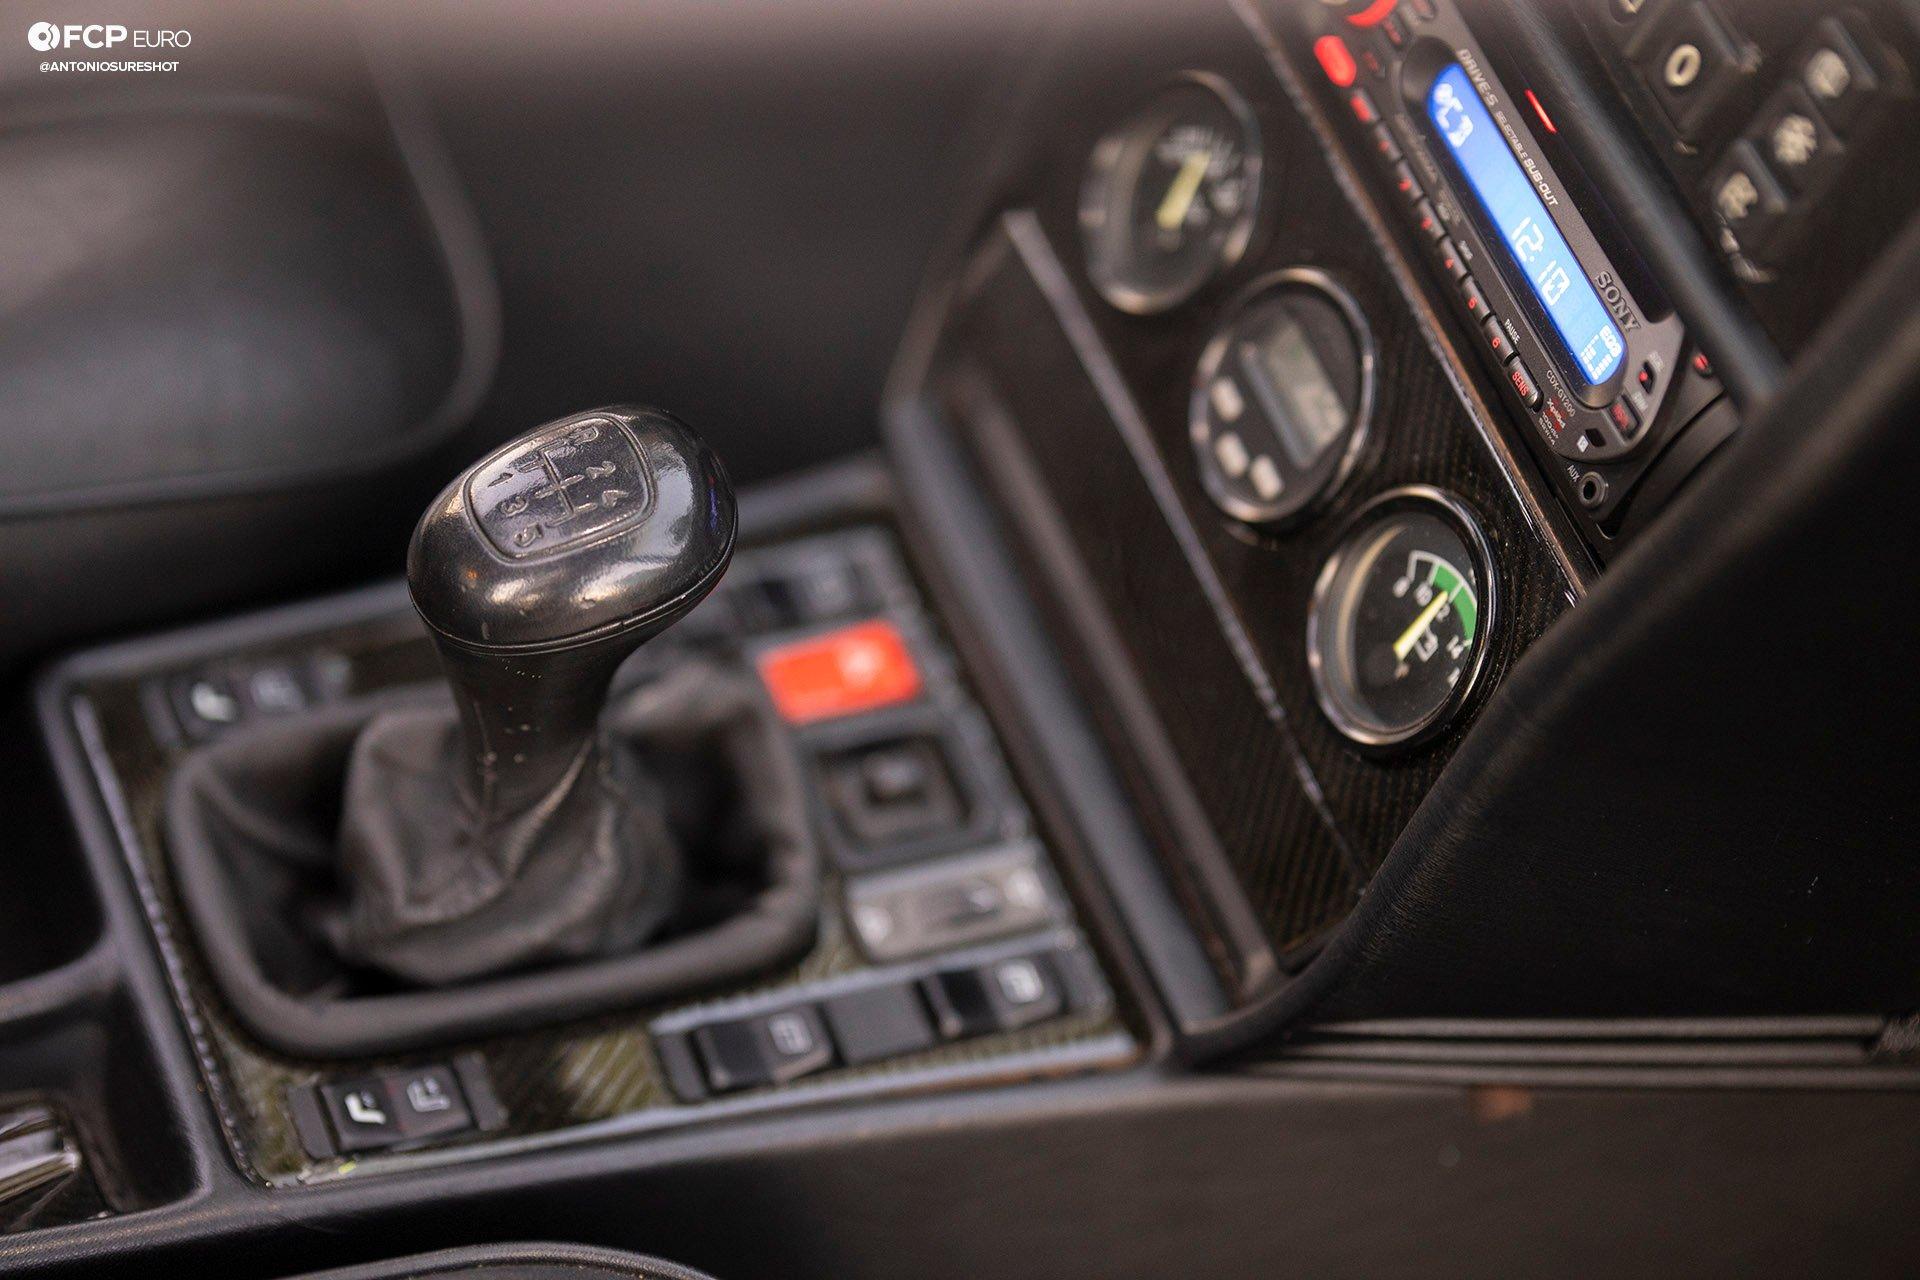 Mercedes Benz 190E 2.3 16v Cosworth  EOSR1600